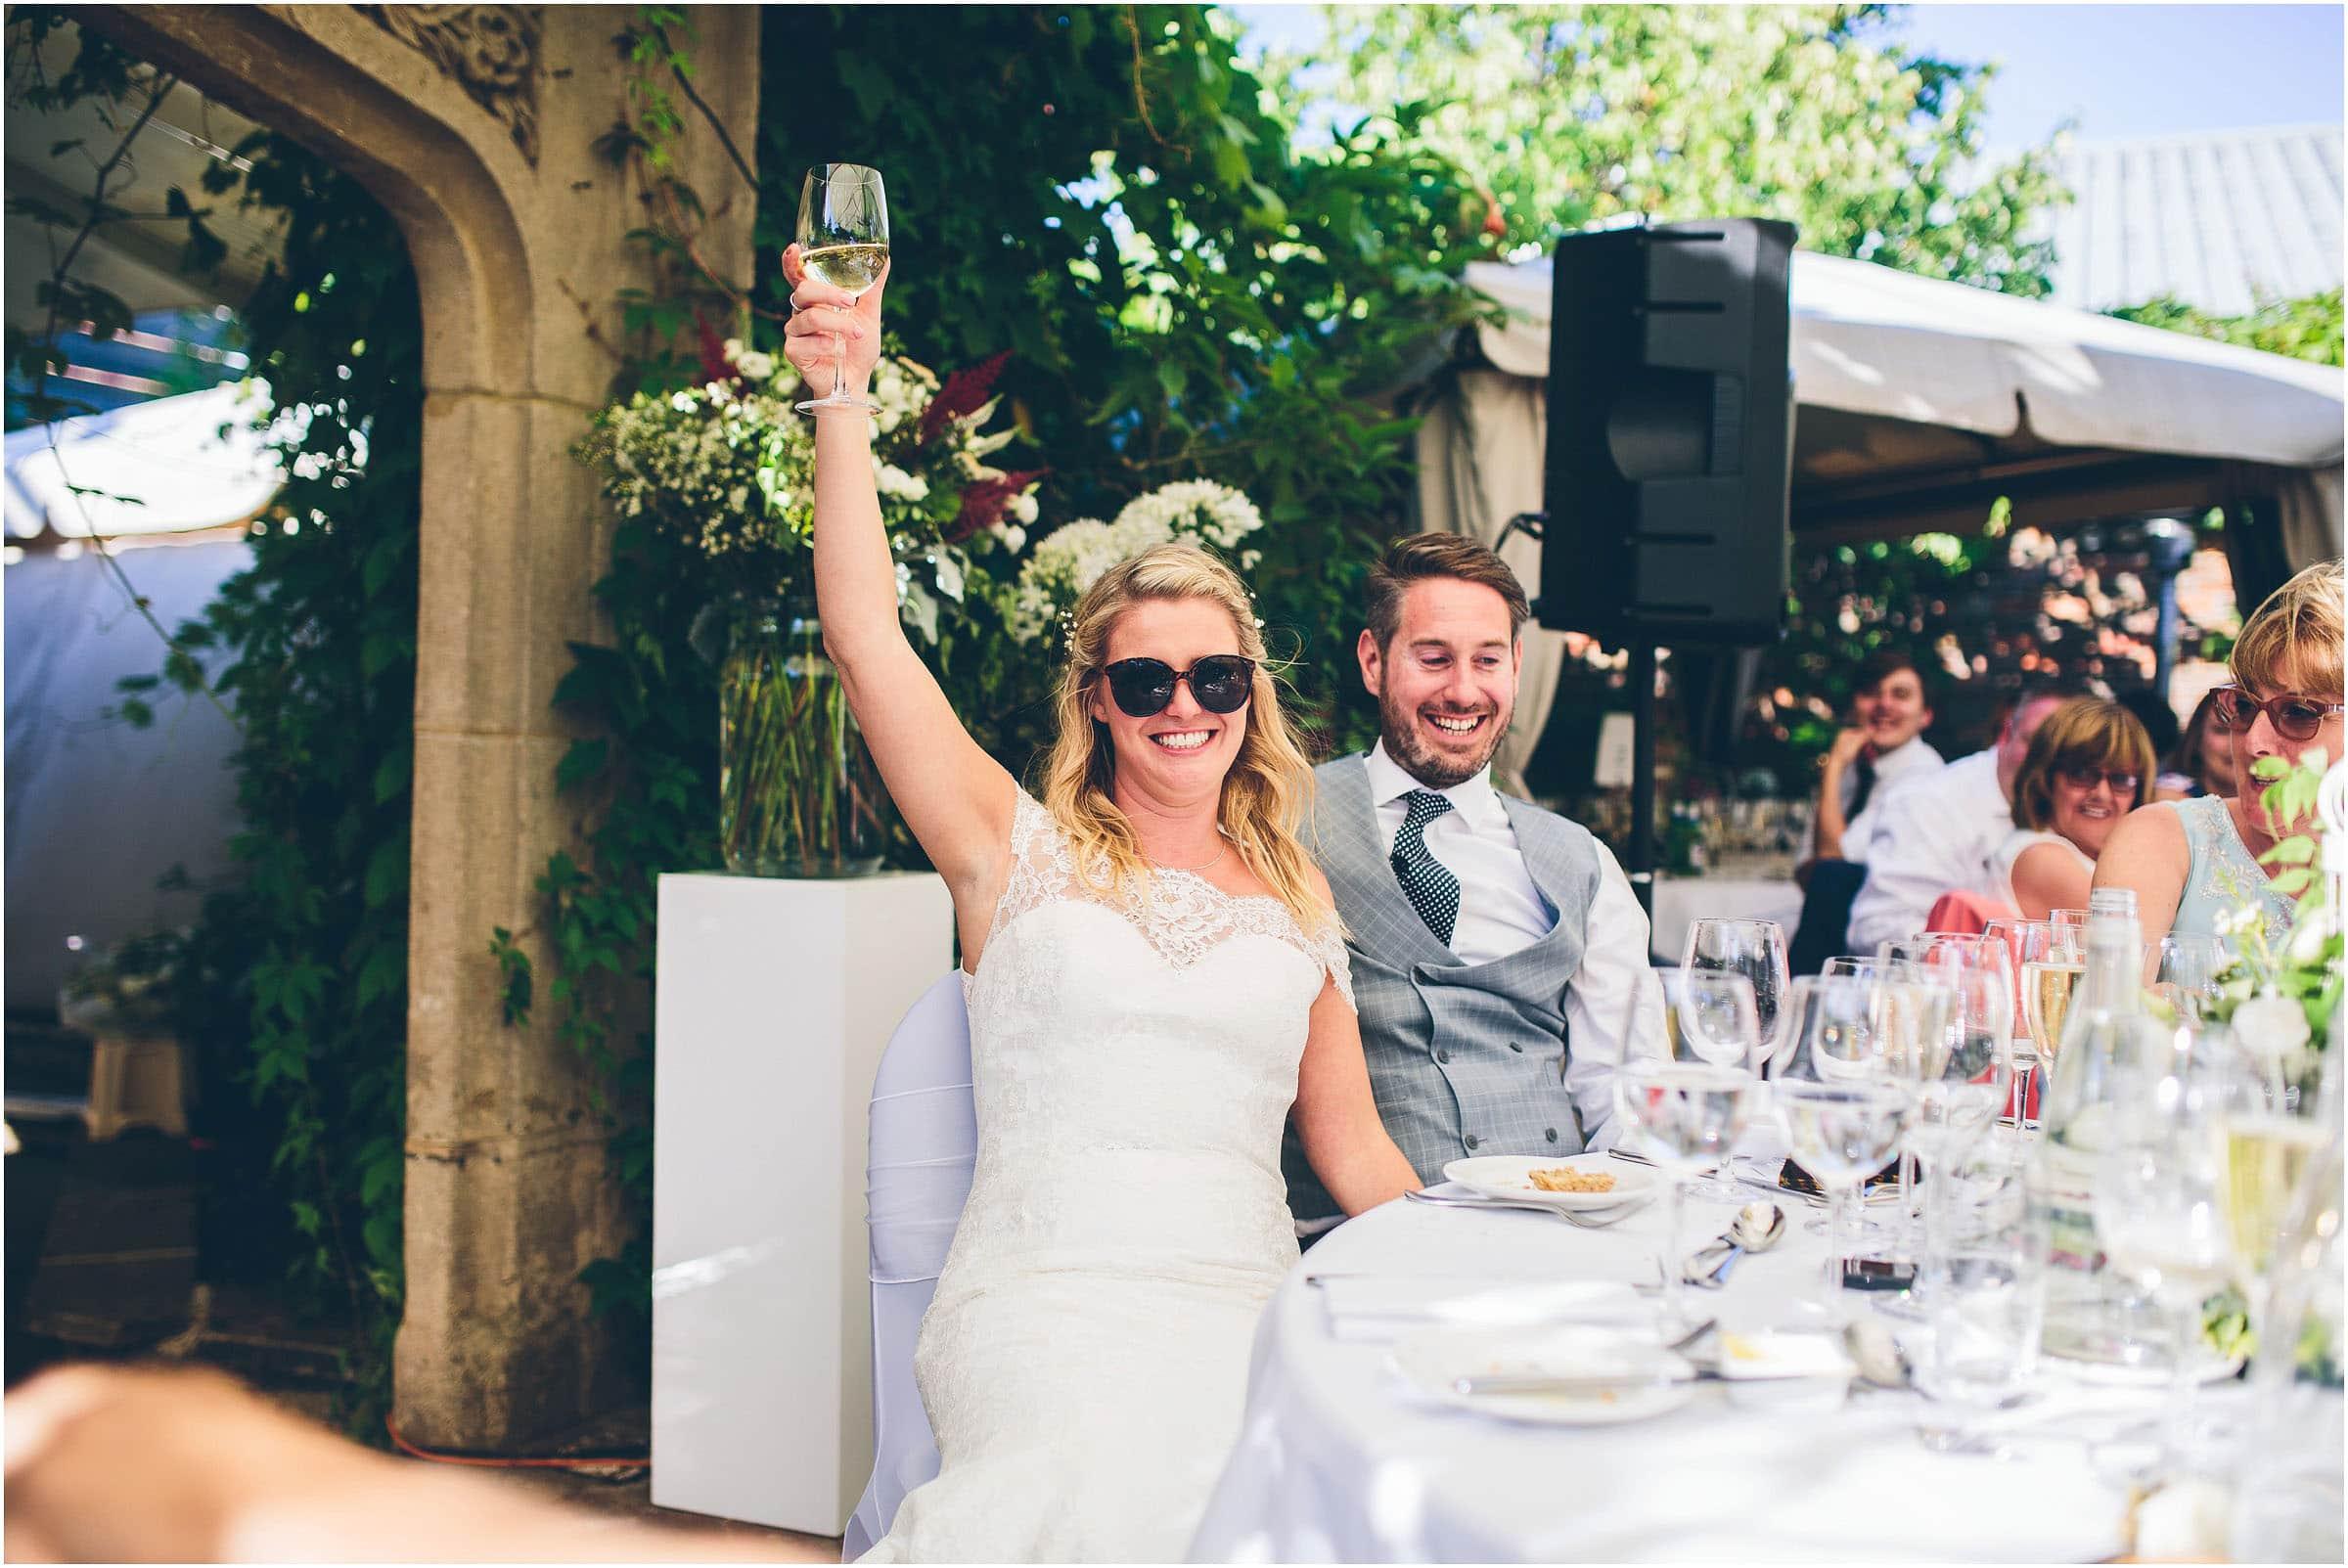 Kensington_Roof_Gardens_Wedding_Photography_0087